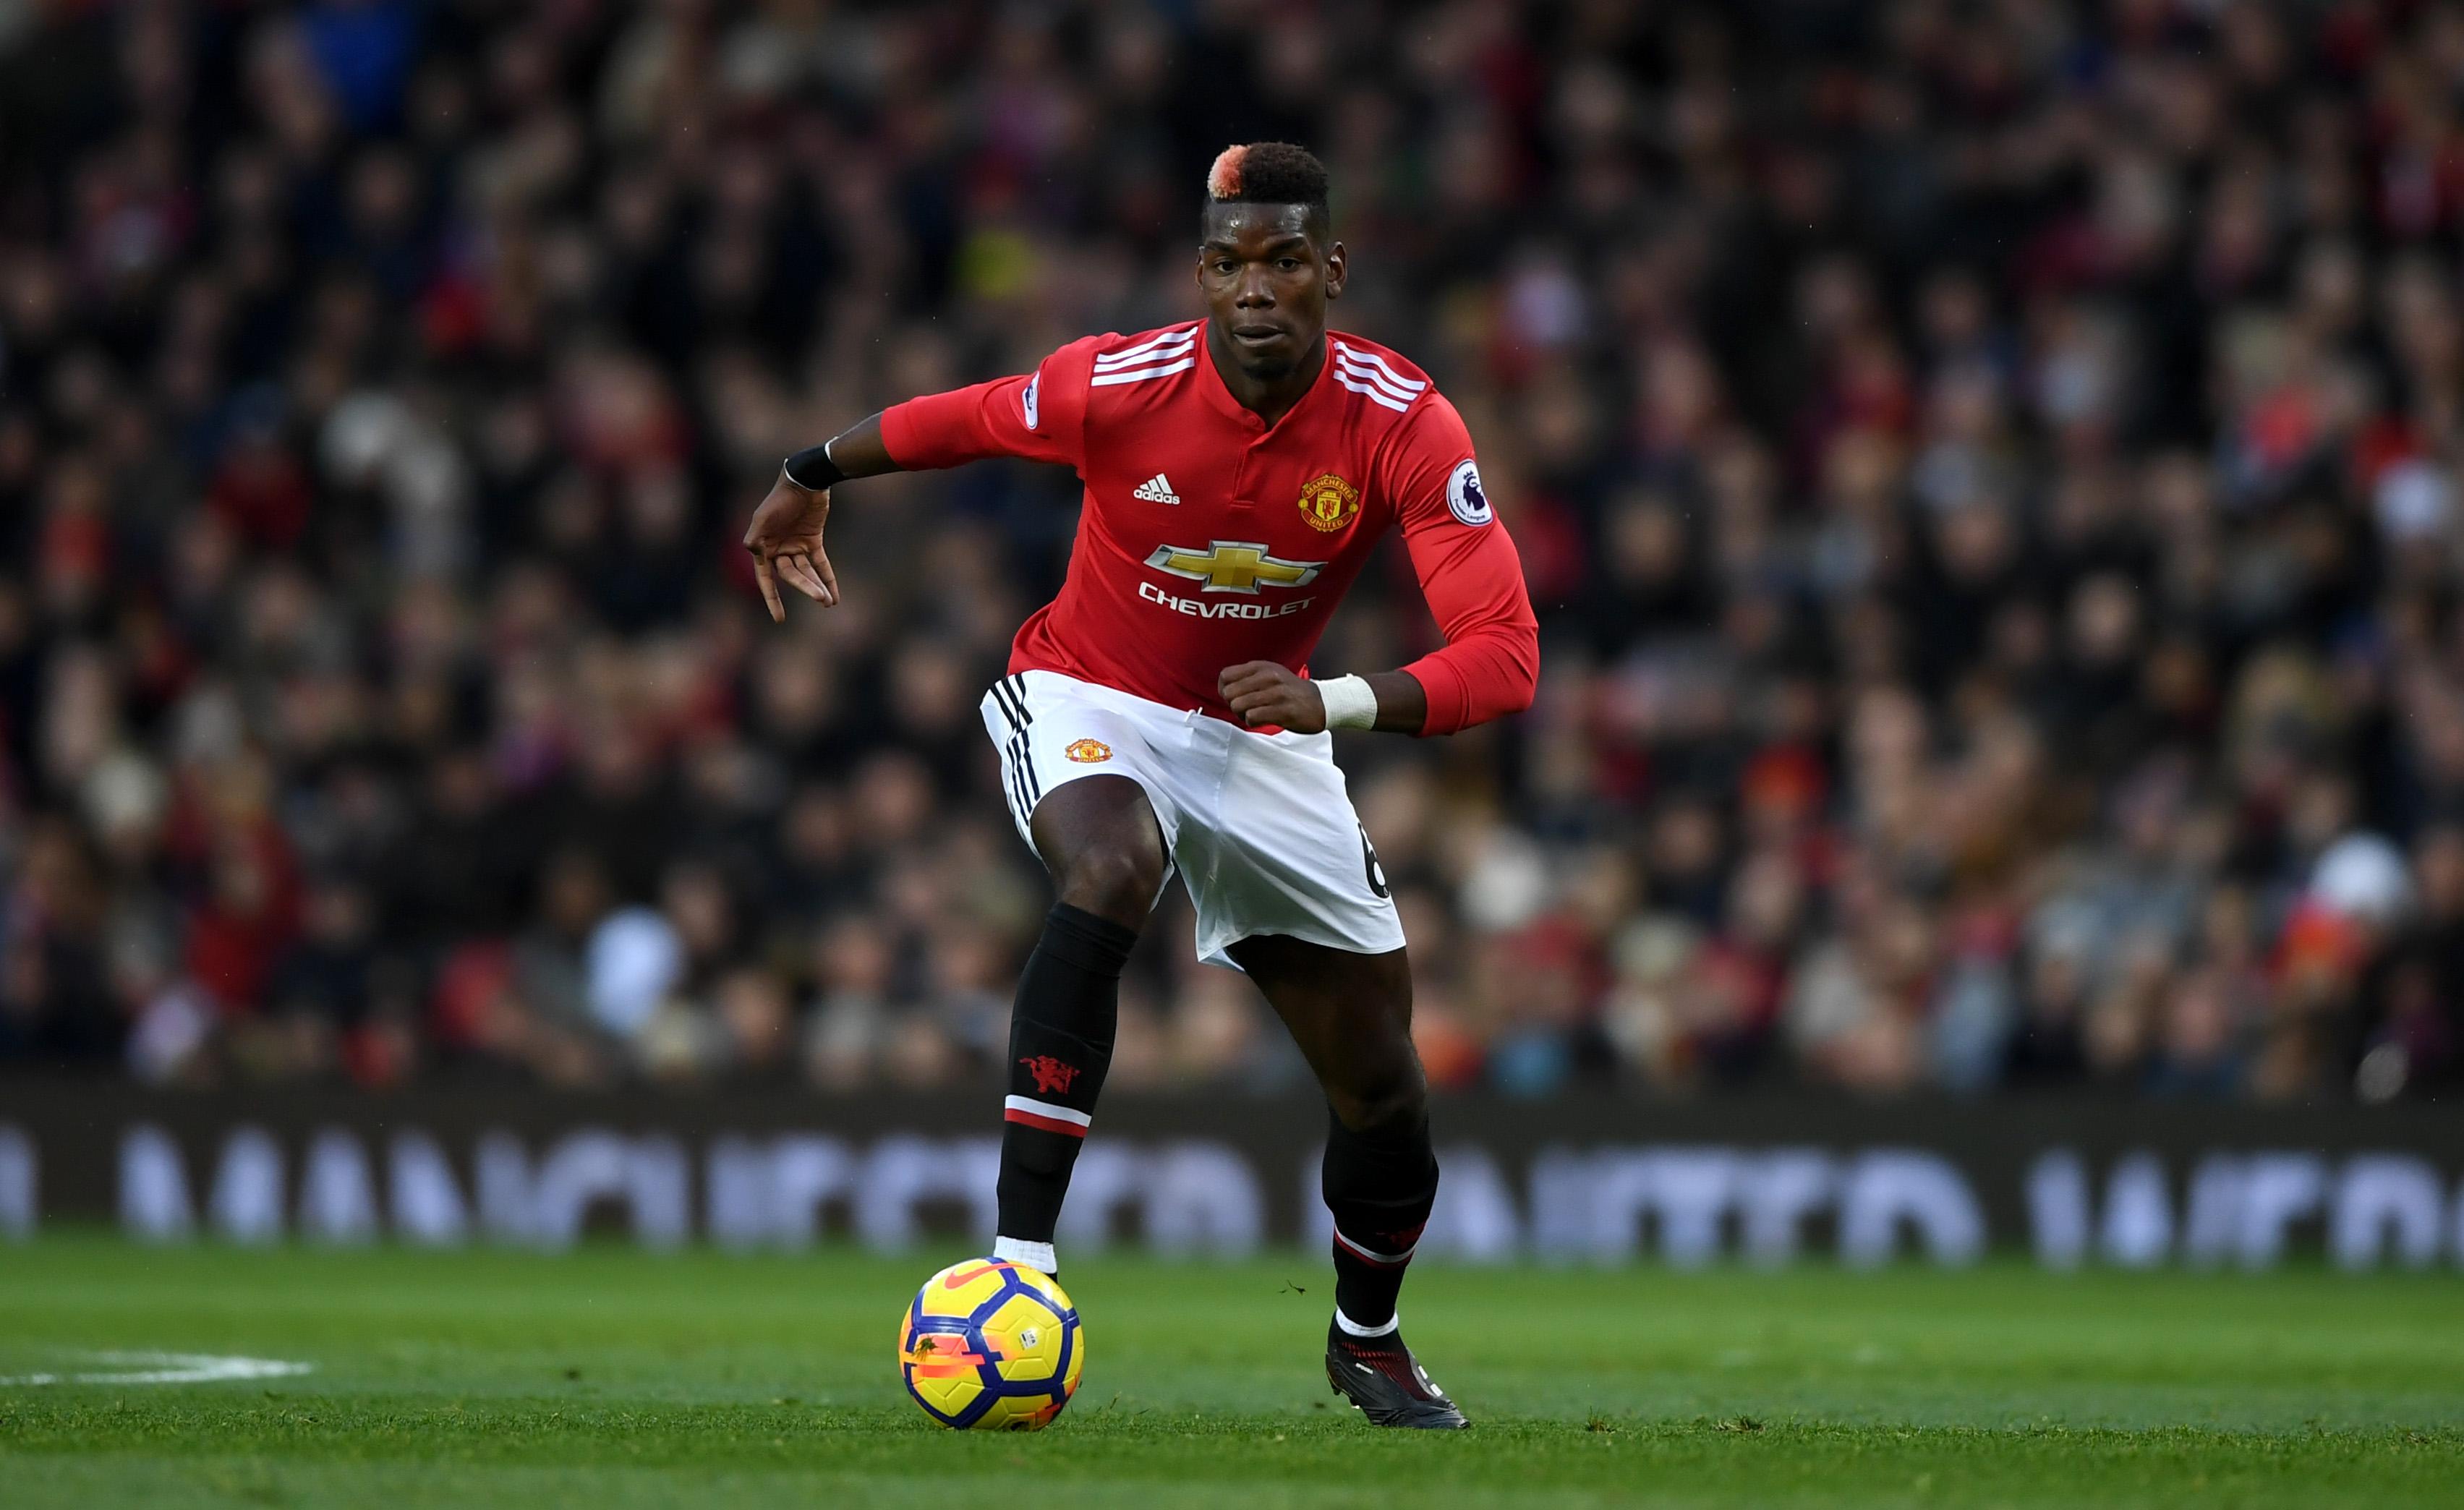 Manchester United: Paul Pogba Massive Miss Against